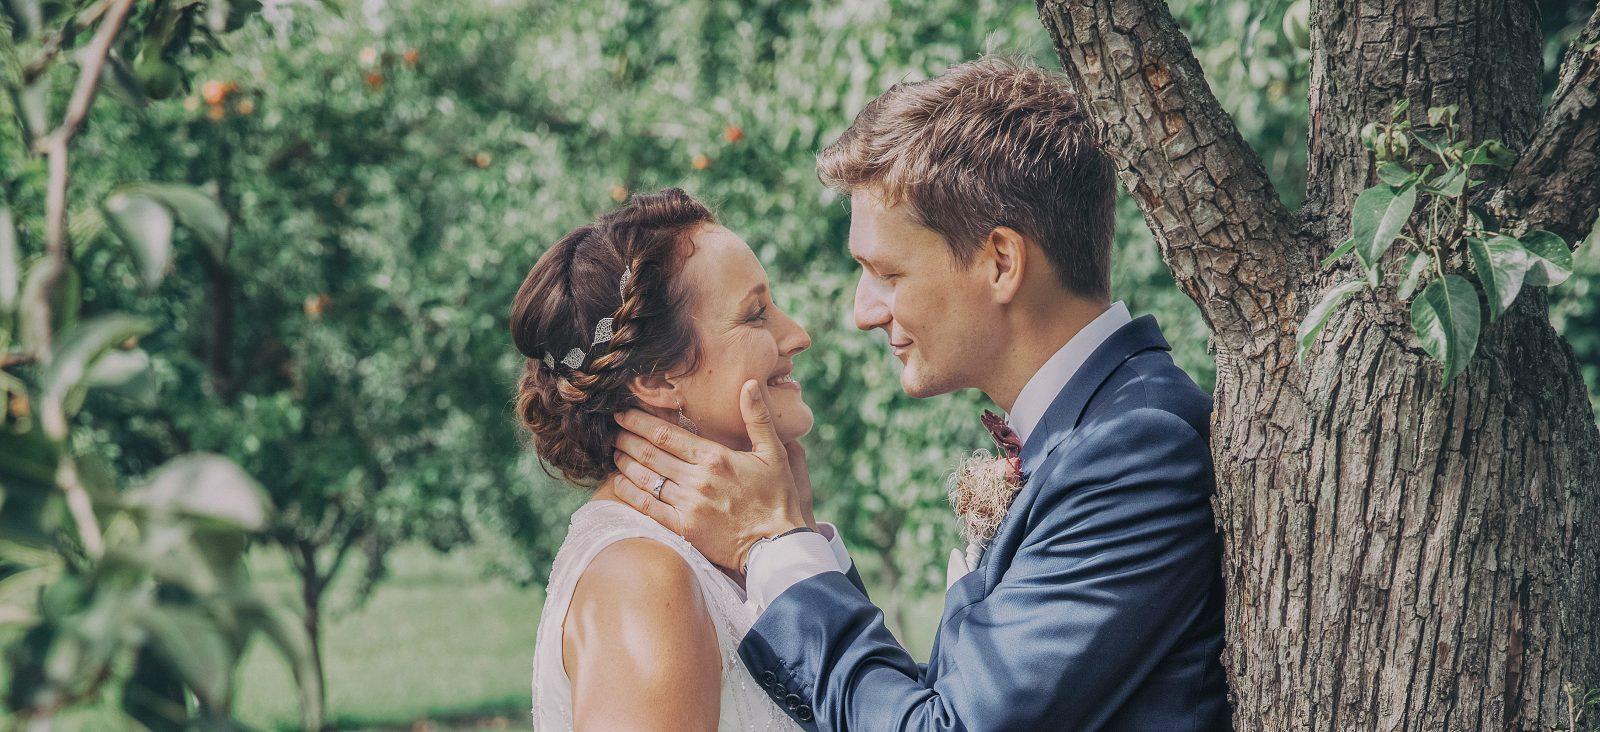 Hochzeit_Potsdam_fotograf_P